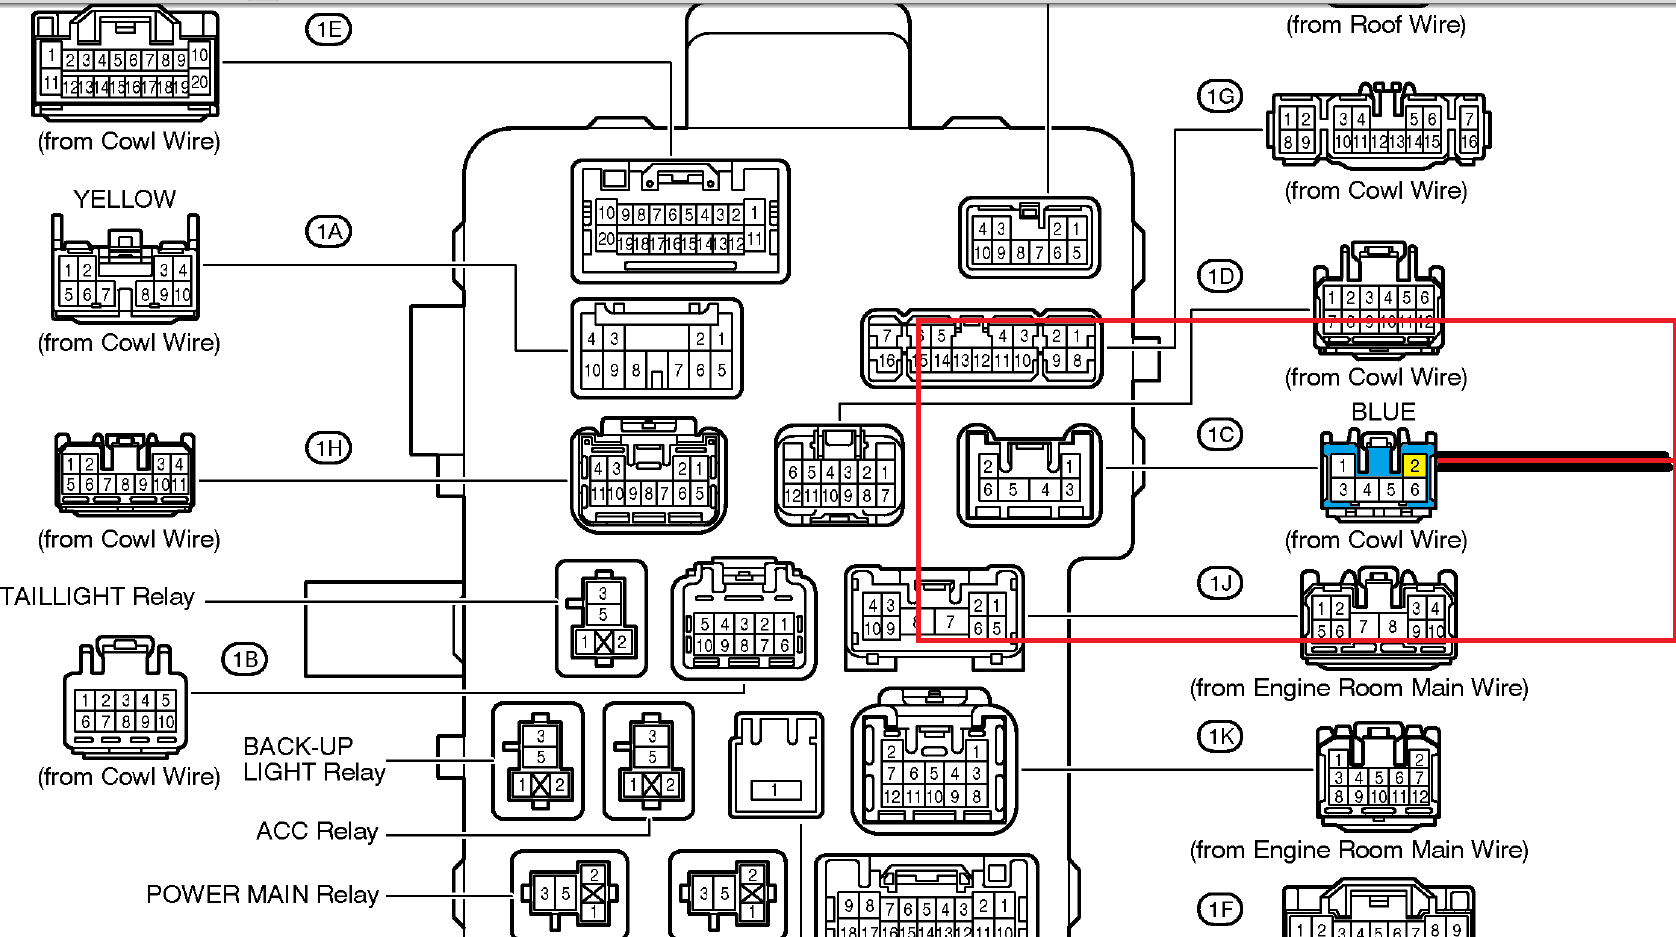 2007 prius fuse diagram wiring diagrams2001 toyota prius fuse box car block wiring diagram 2007 accord fuse diagram 2001 sienna fuse